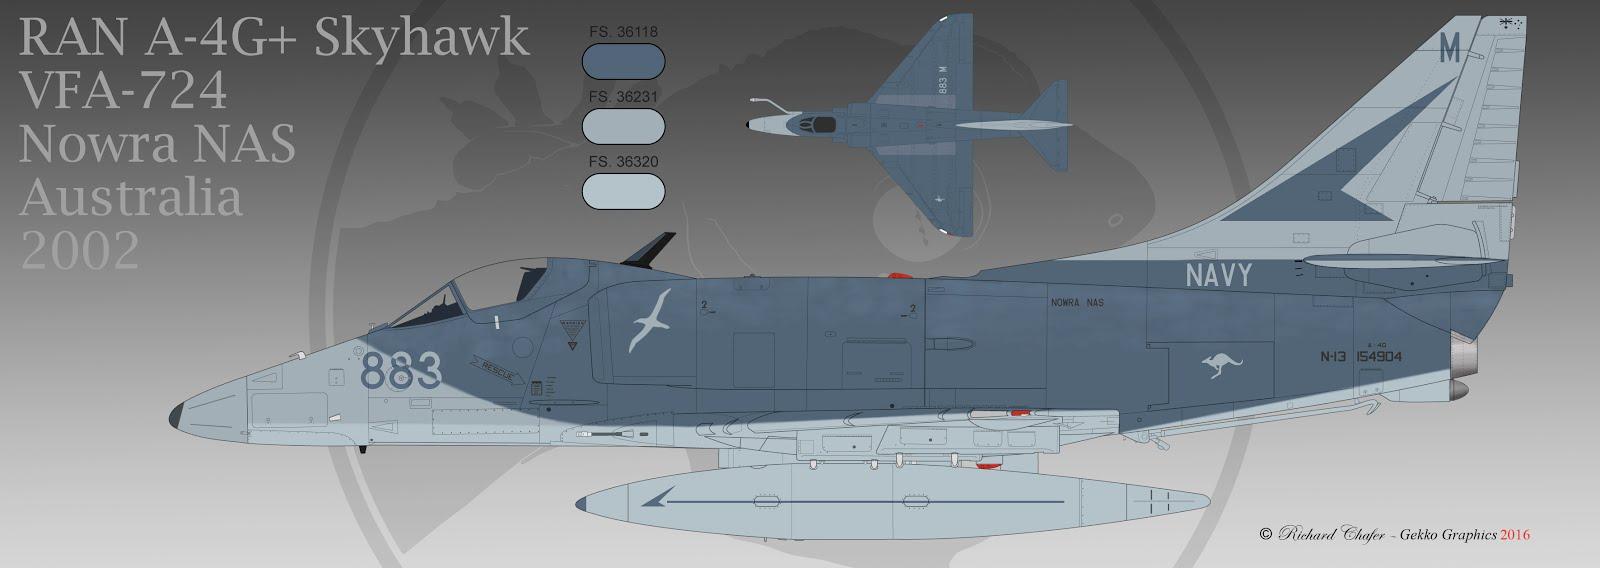 RAN A-4G+ Skyhawk 2002